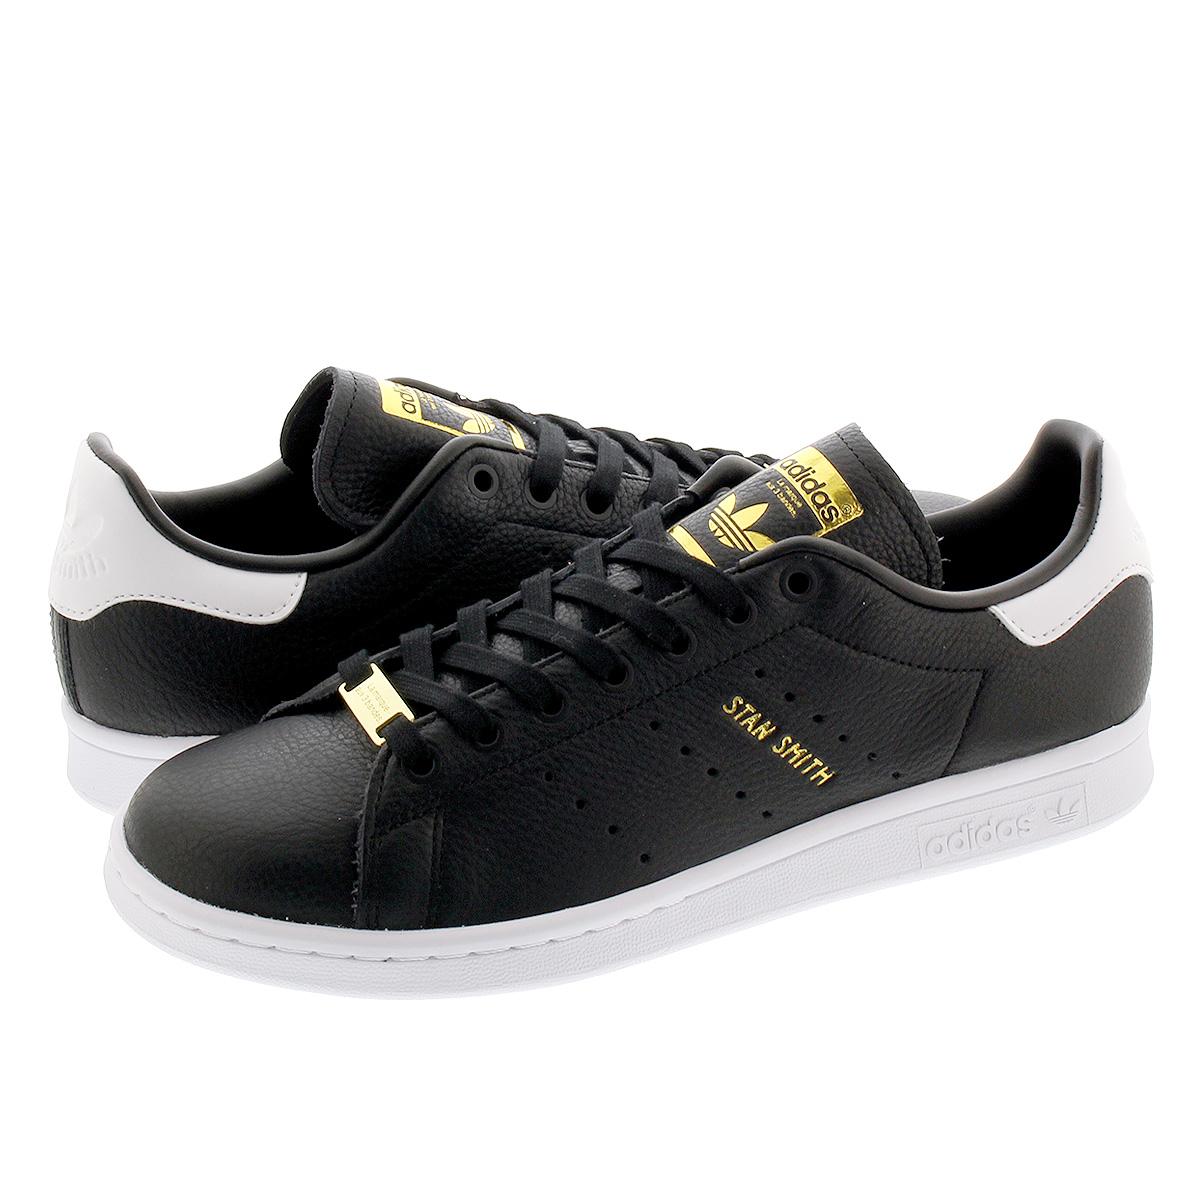 adidas STAN SMITH アディダス スタンスミス CORE BLACK/CORE BLACK/FTWR WHITE eh1476